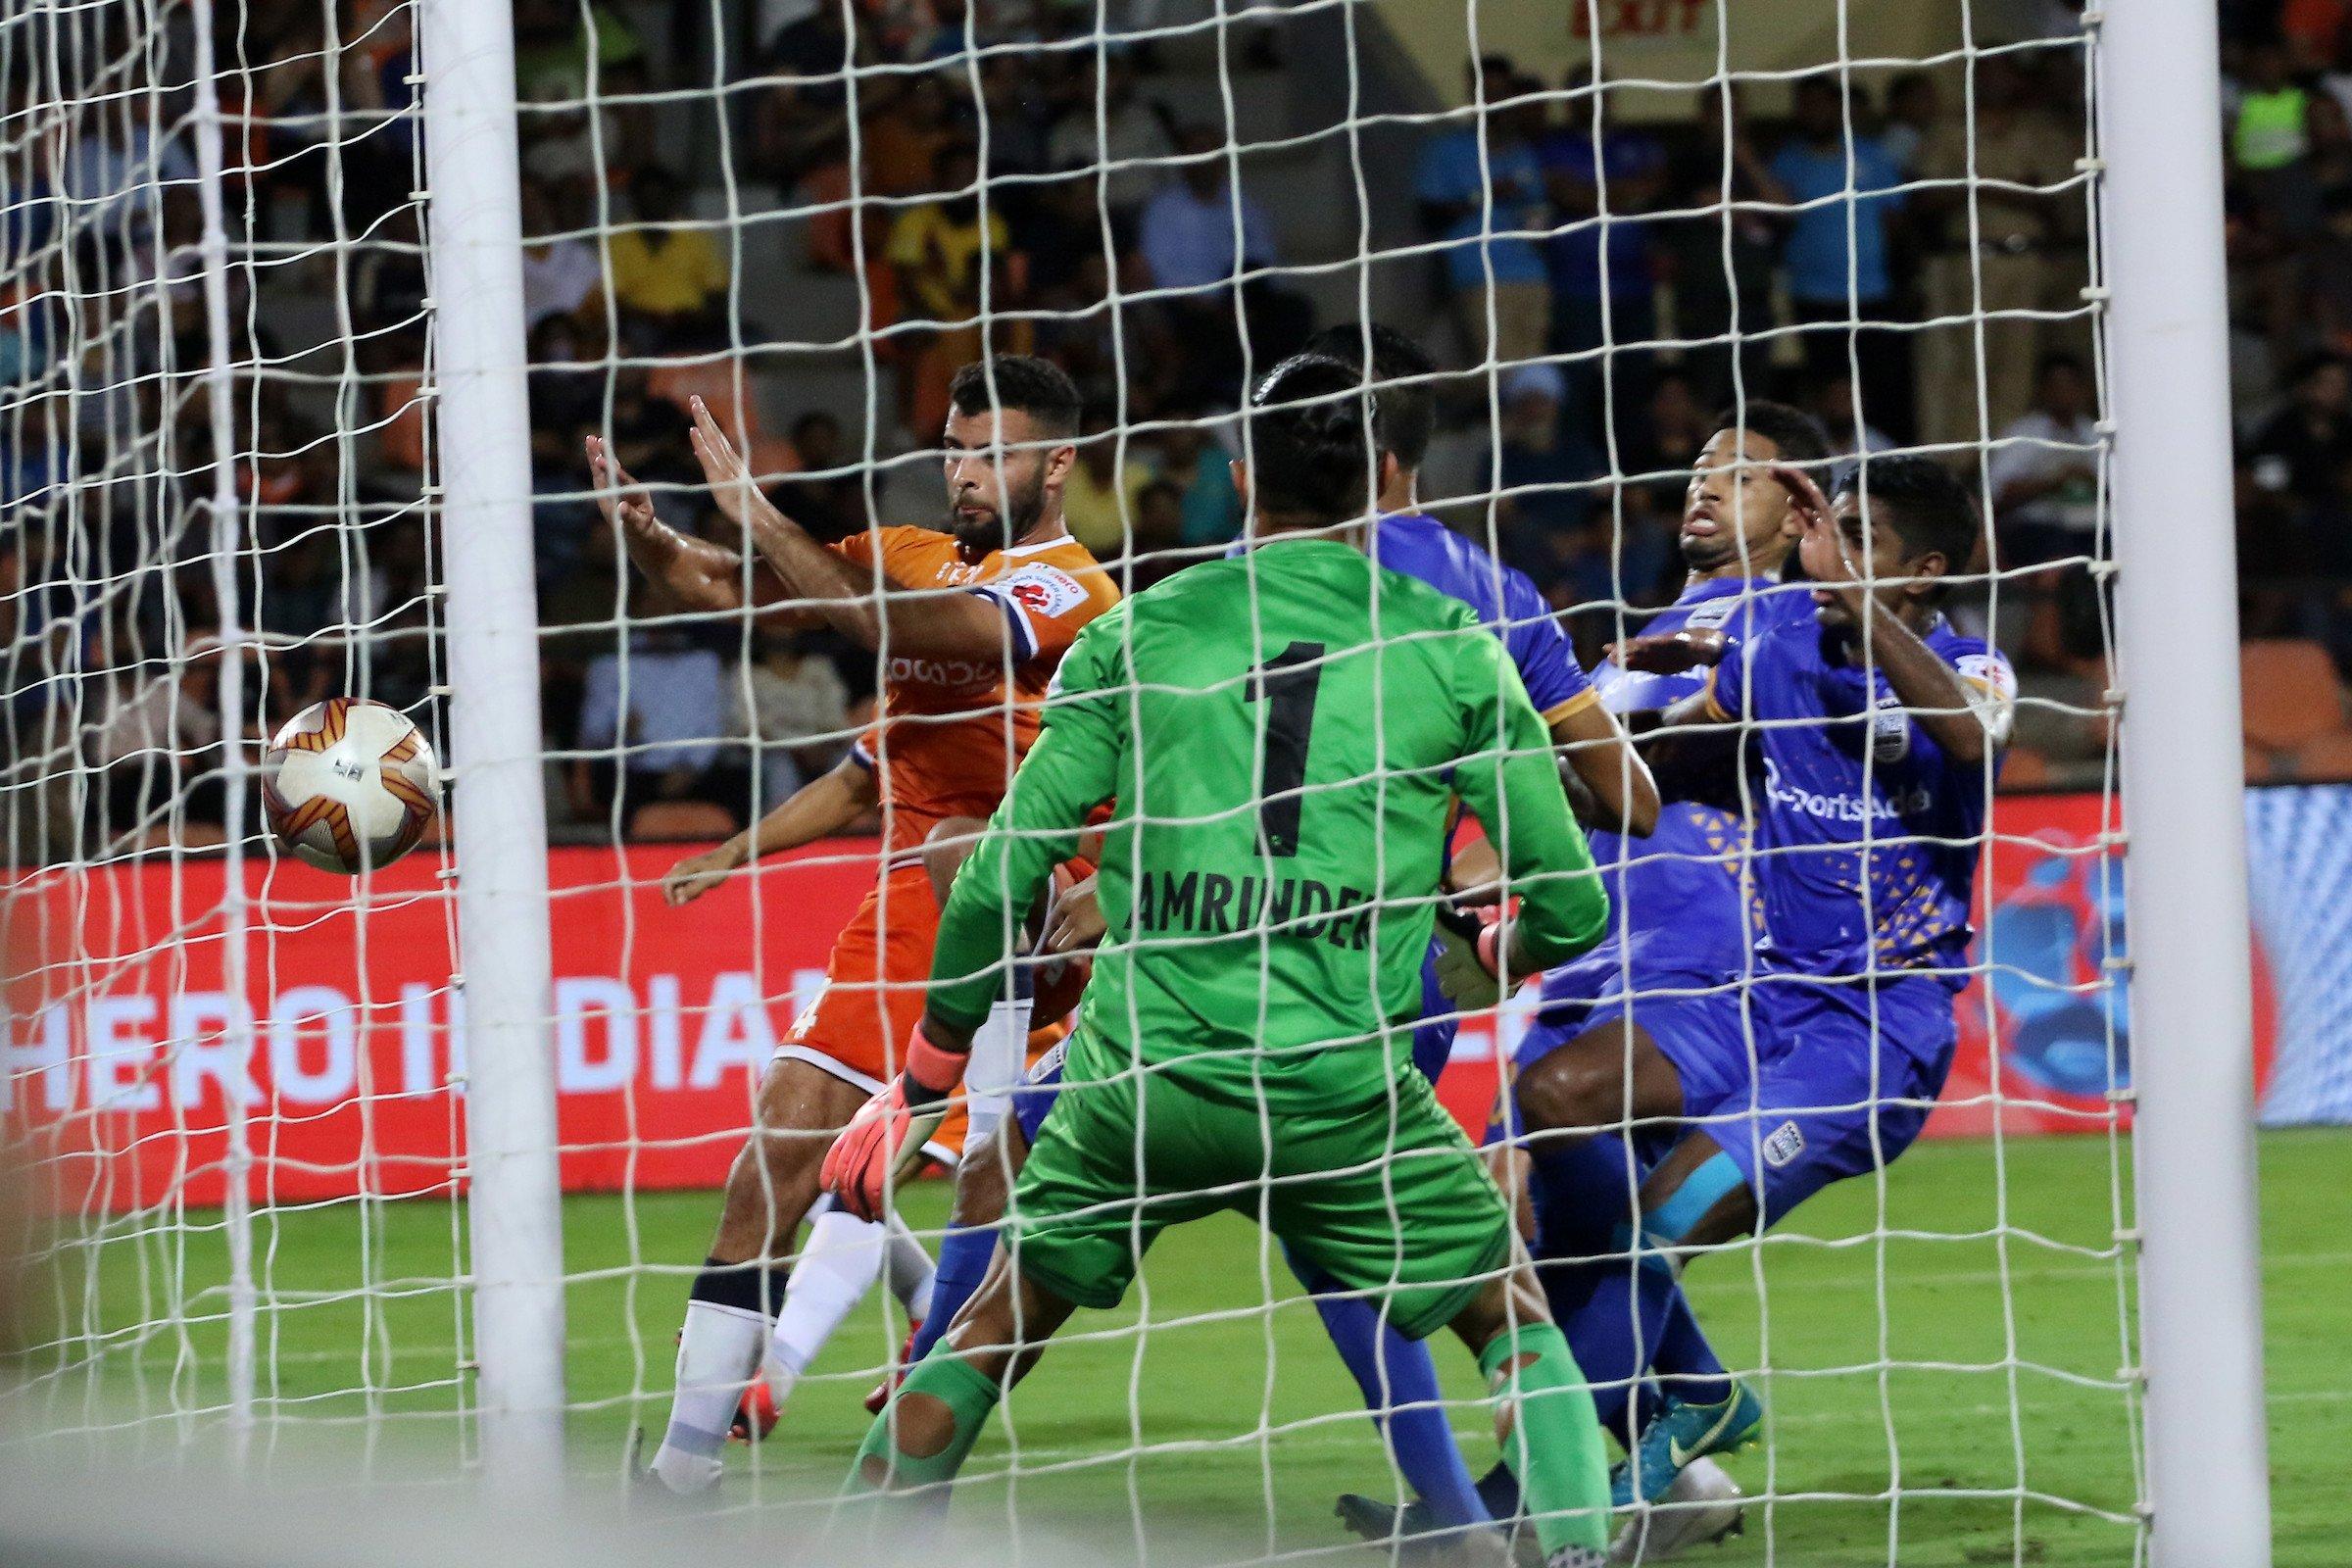 ISL 2019/20: Mumbai City FC bested by FC Goa in a six-goal thriller